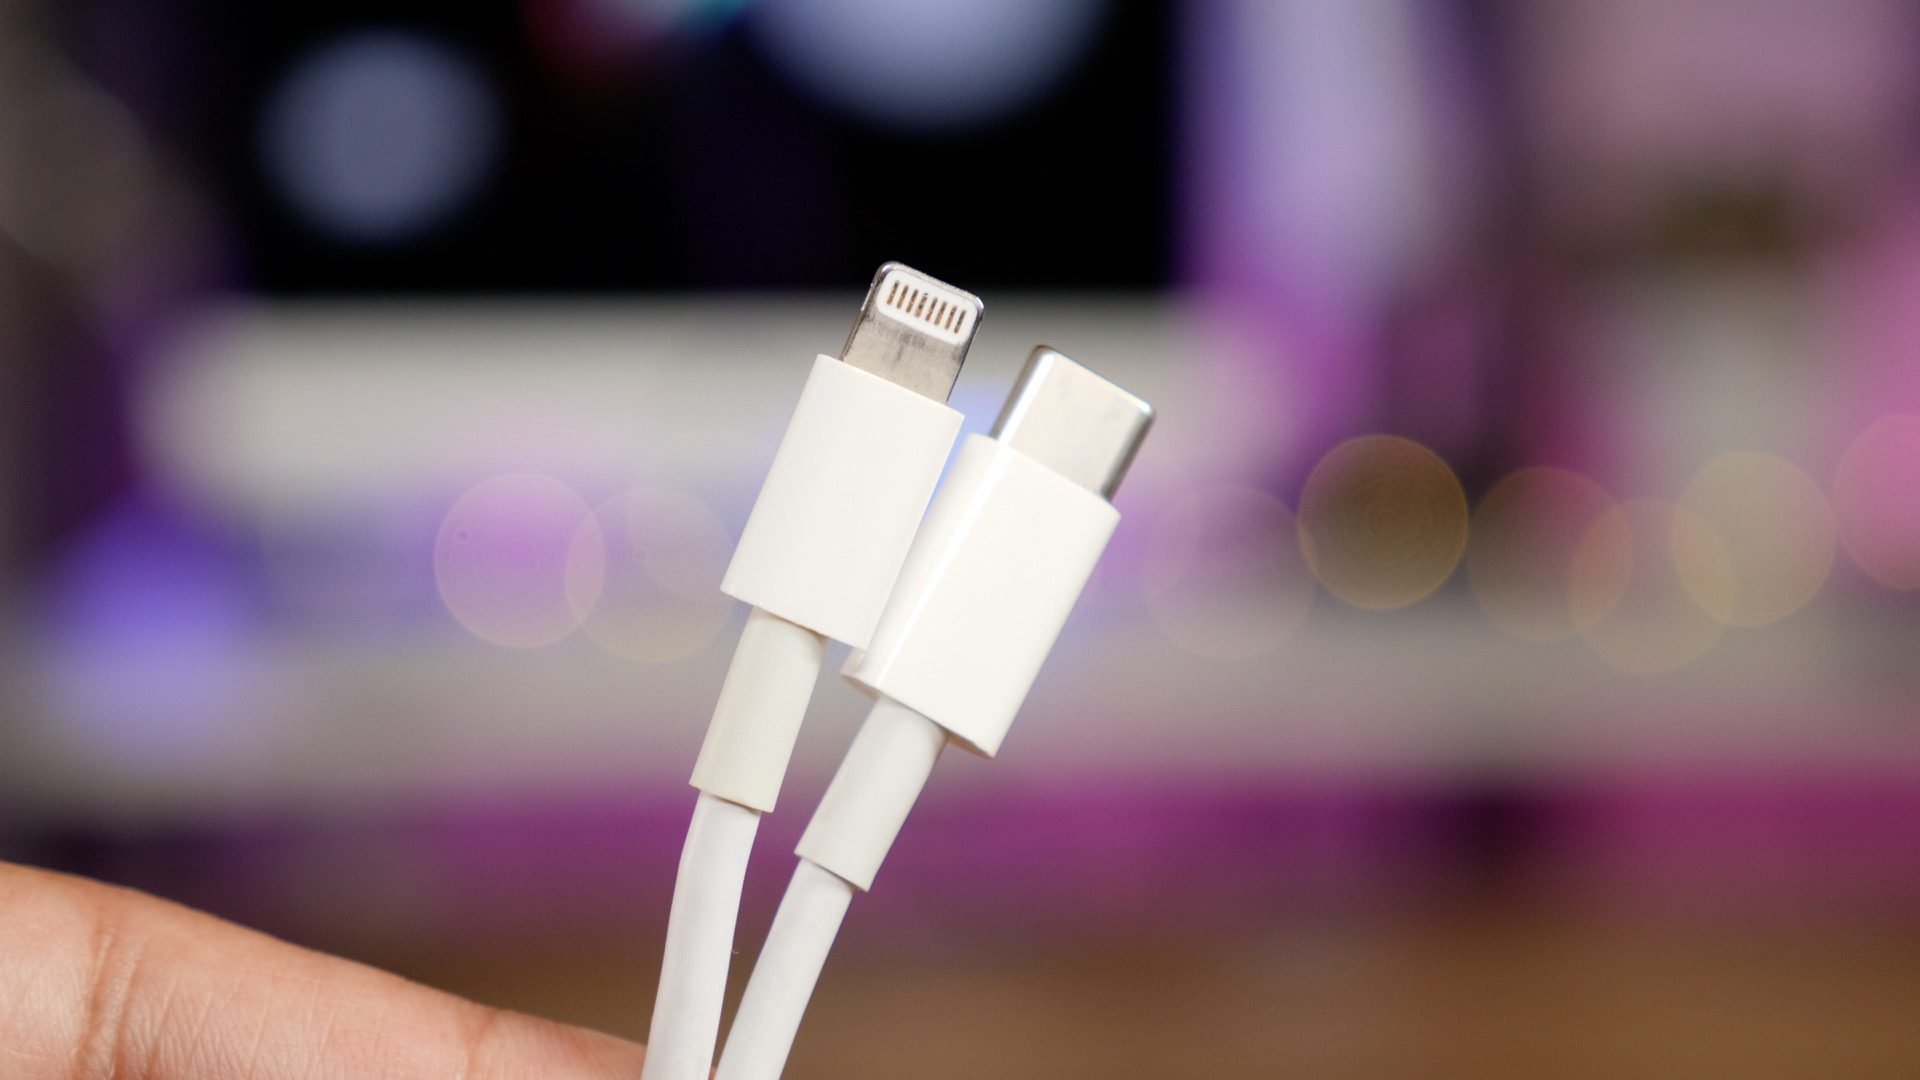 USB-C a Lightning